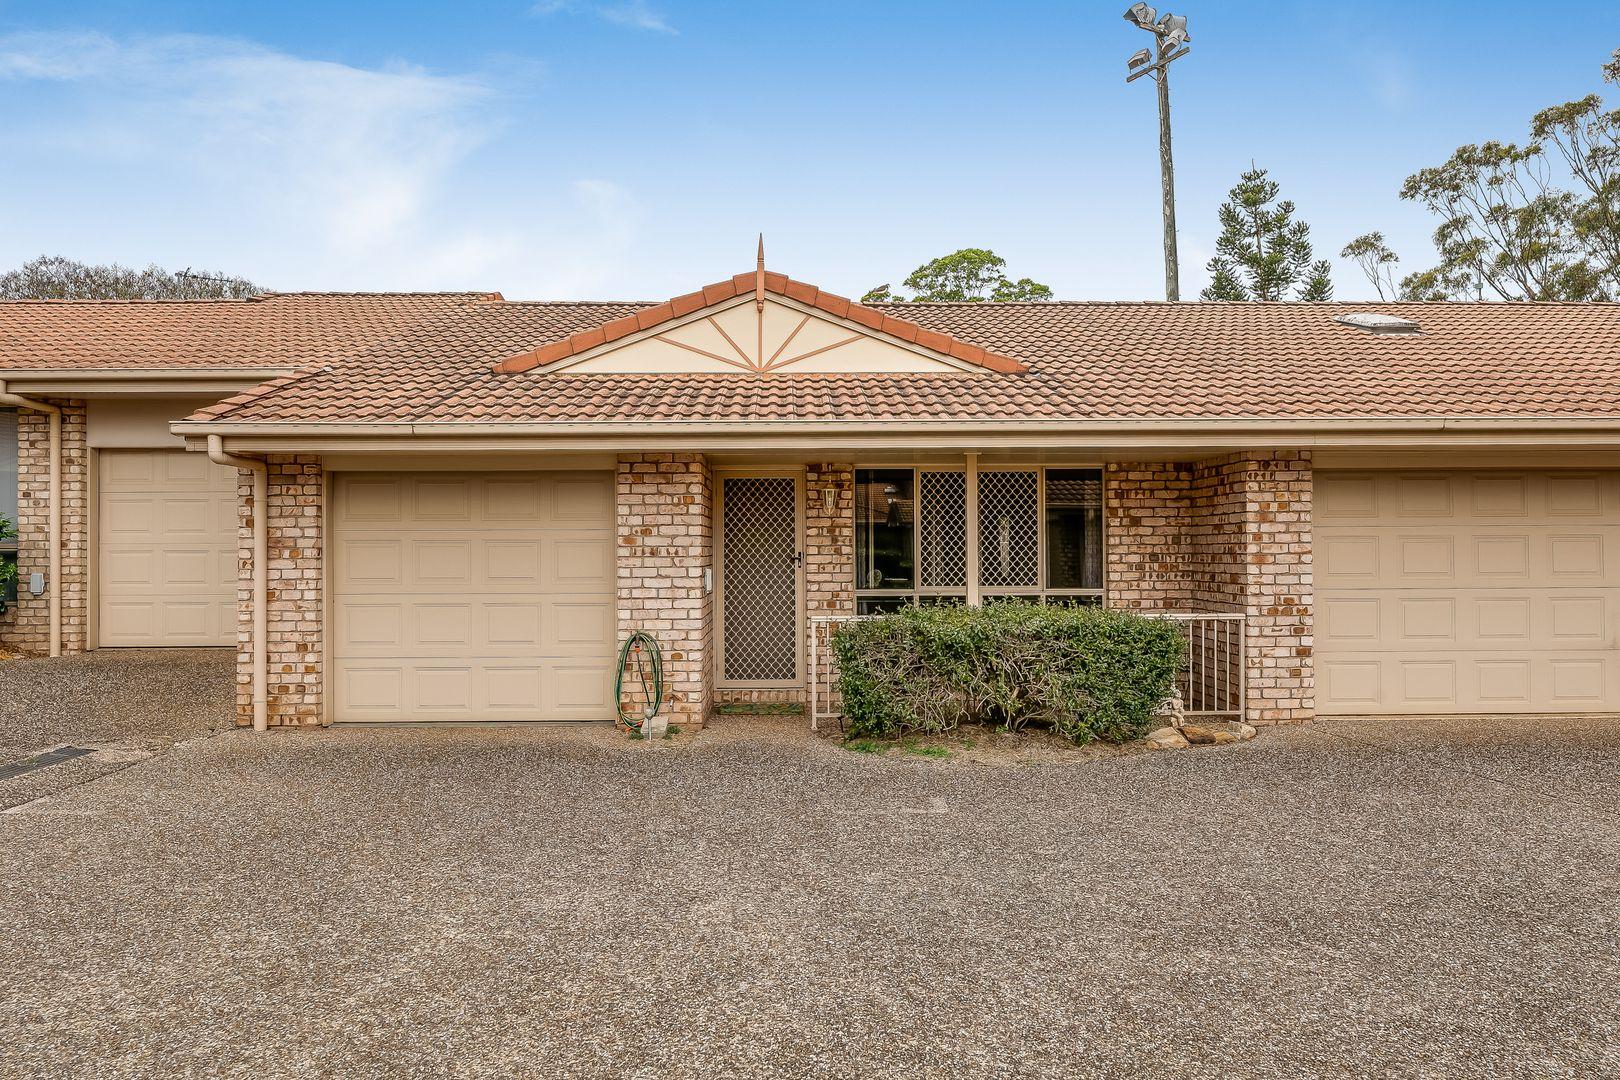 9/23 Lendrum Street, Newtown QLD 4350, Image 0